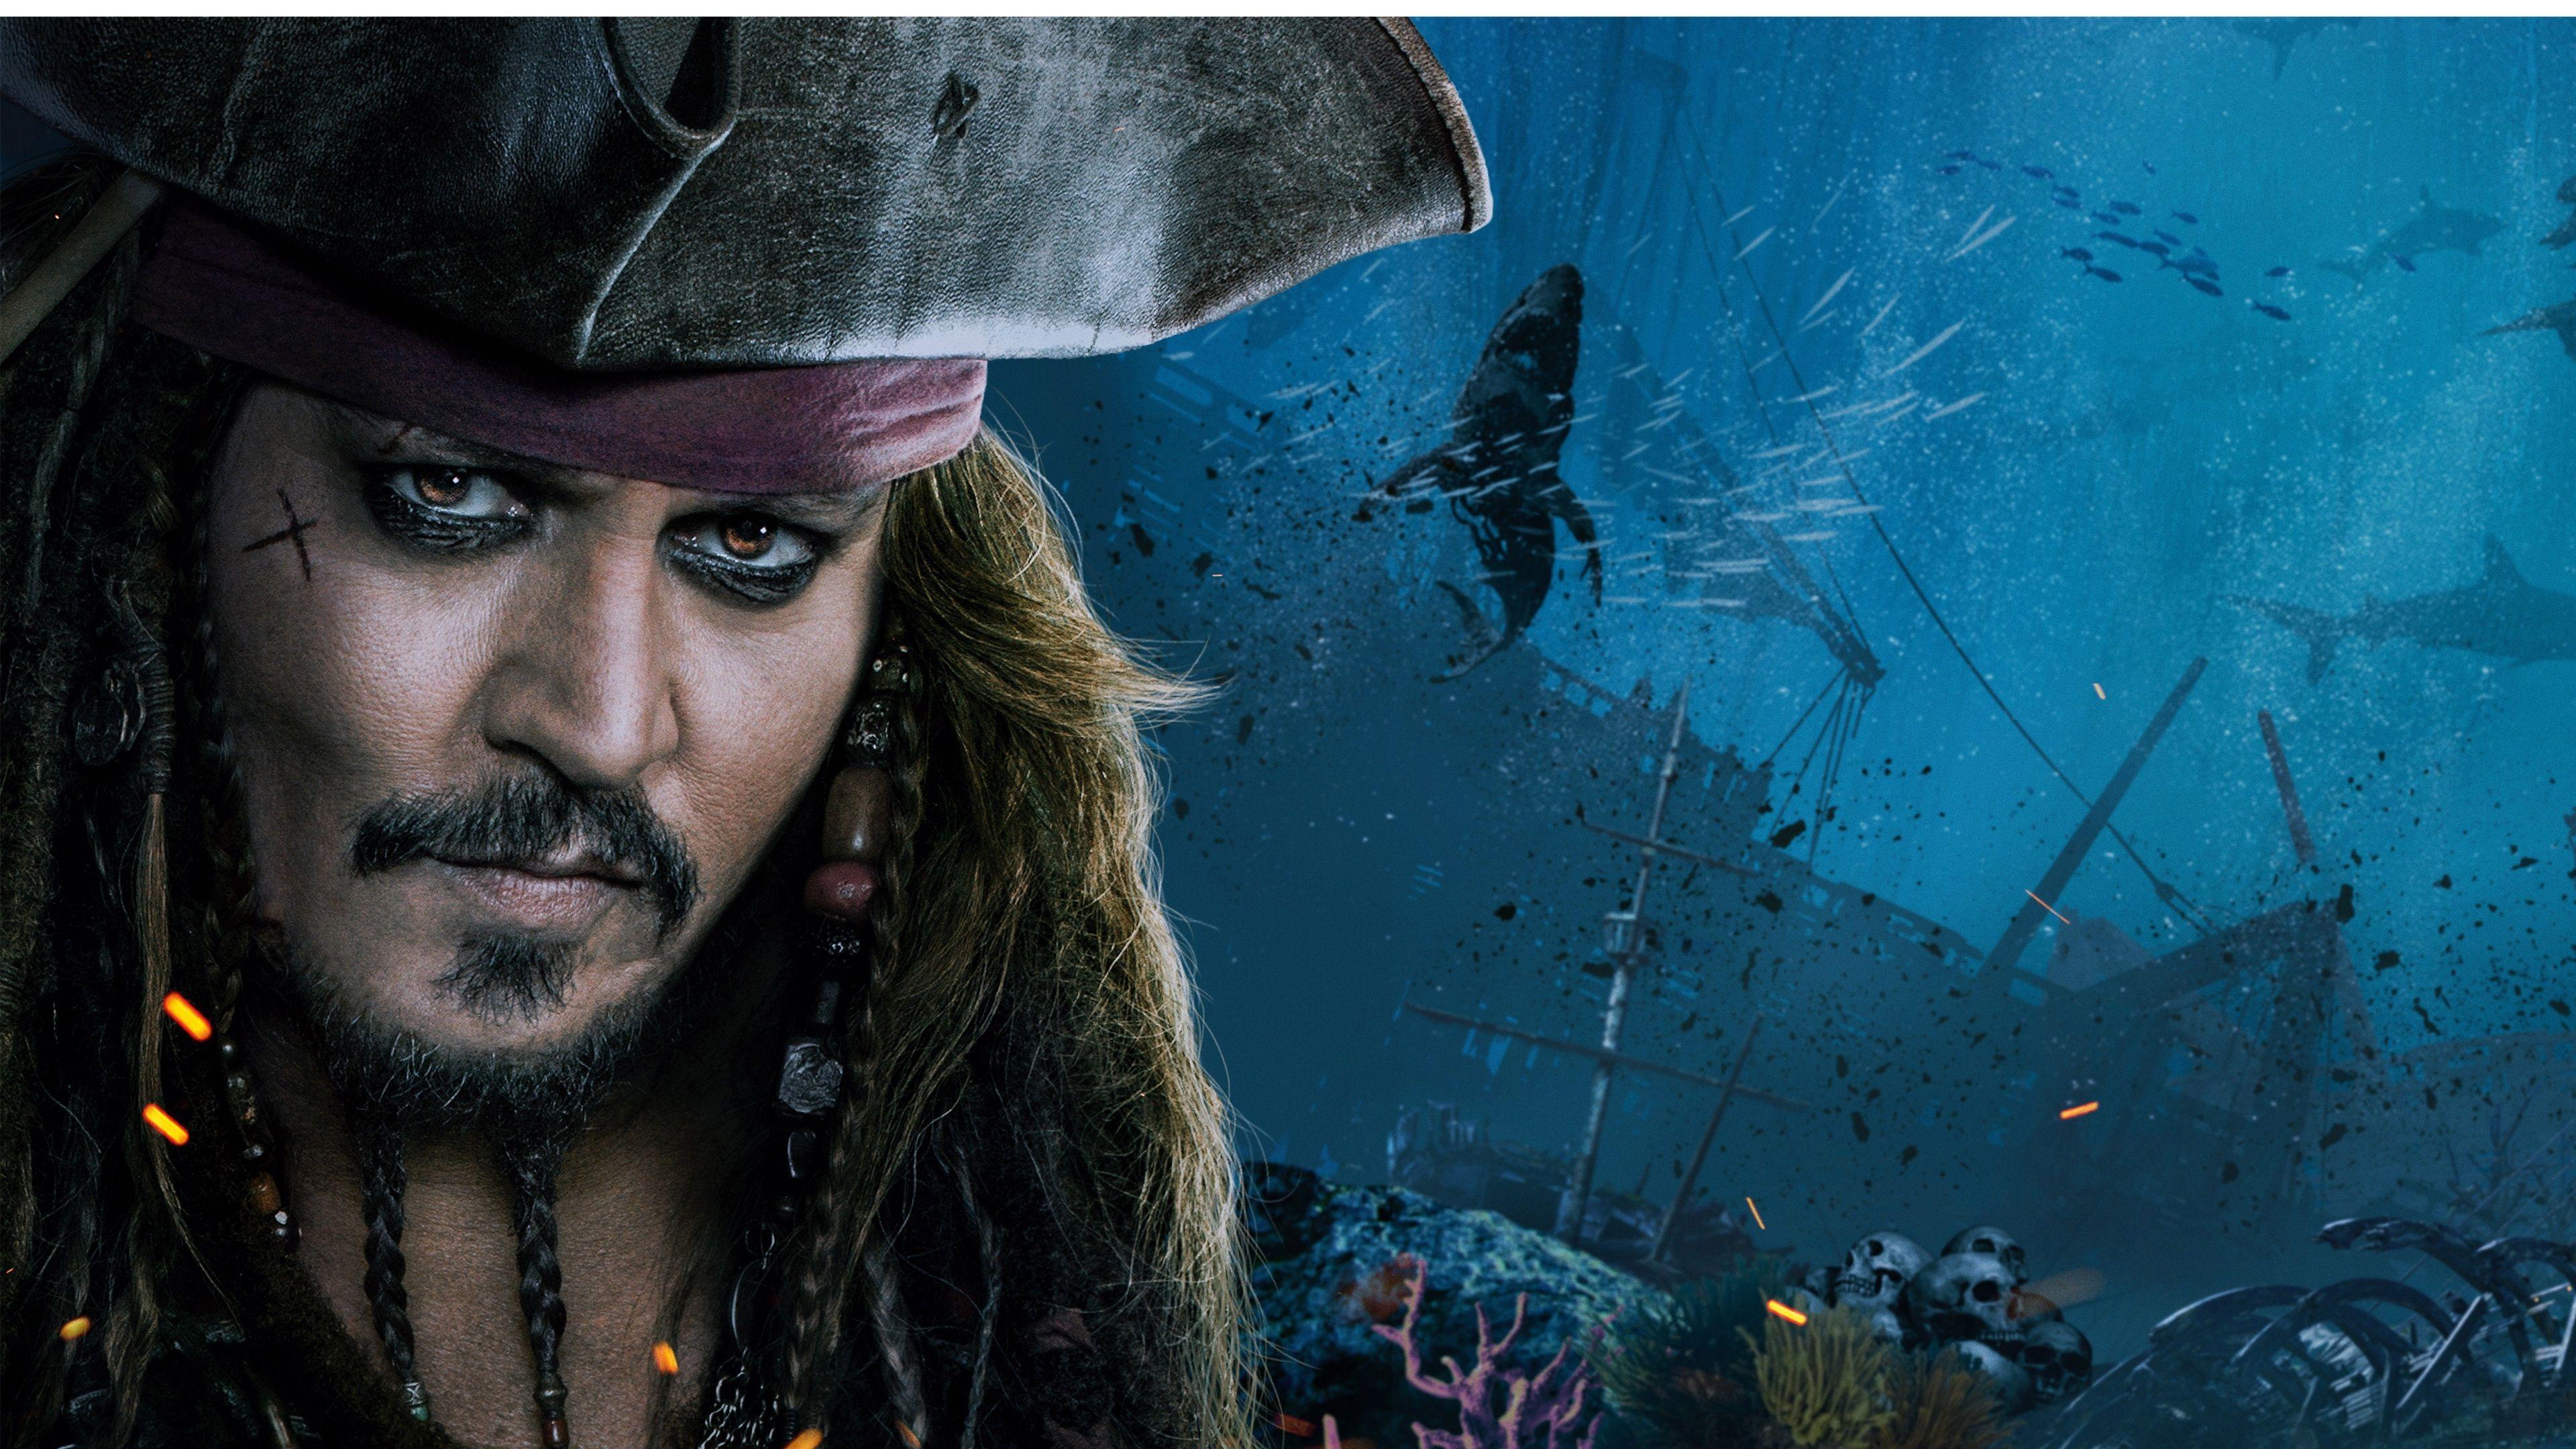 3840x2160 Pirates Of The Caribbean Dead Men Tell No Tales 4k Amazing Wallpaper Hd For Desktop Pirates Of The Caribbean Jack Sparrow Jack Sparrow Wallpaper